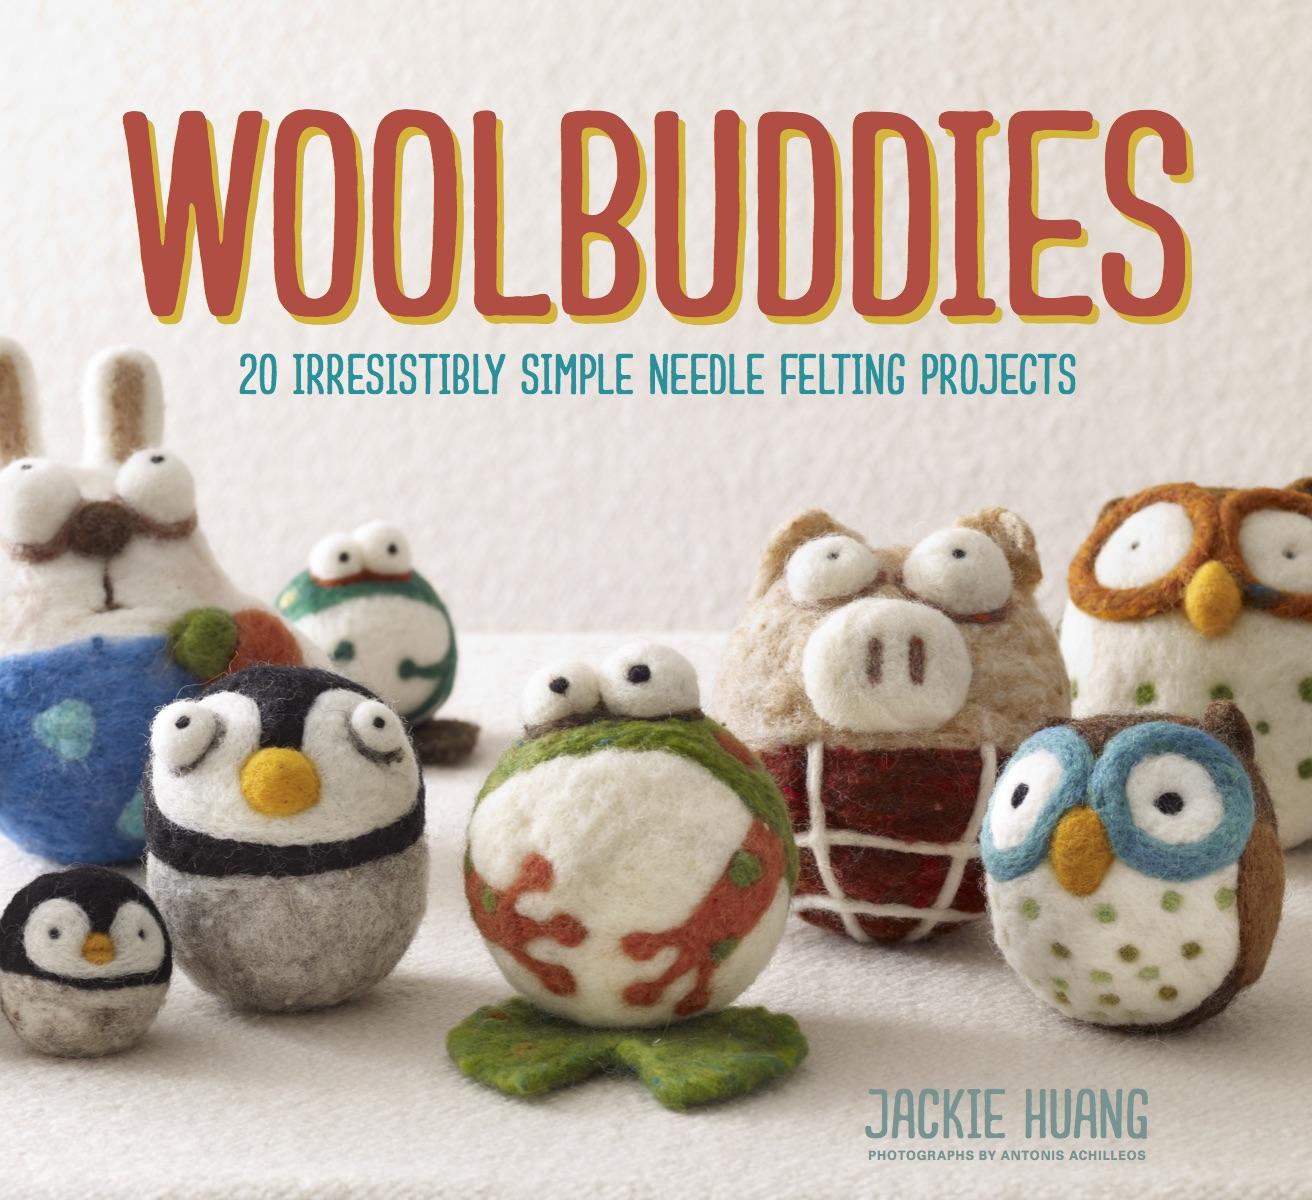 woolbuddies_frontcvr_approved.jpg